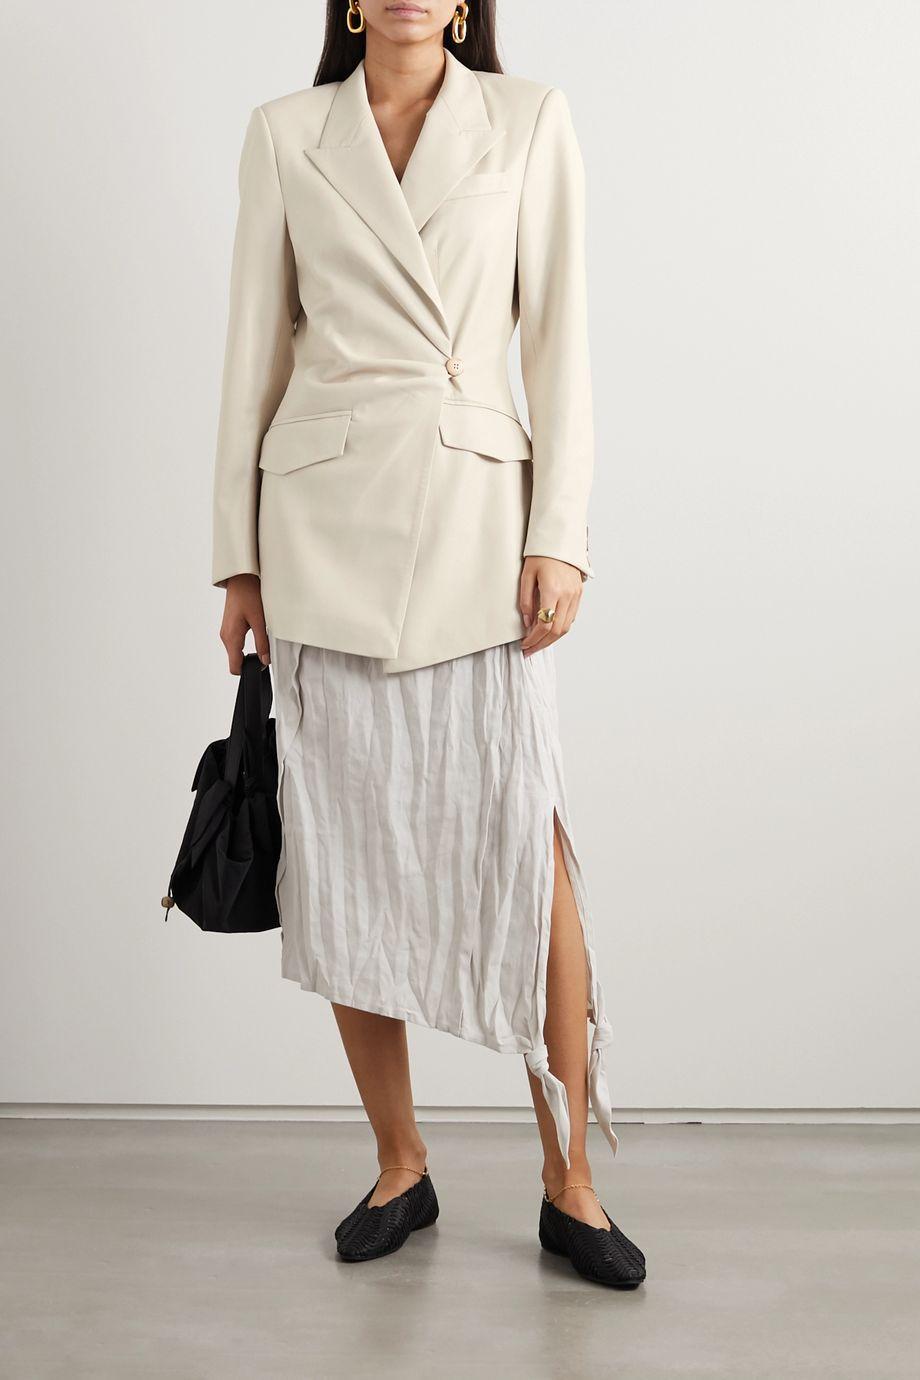 Nanushka Blair 缩褶双排扣纯素皮革西装外套